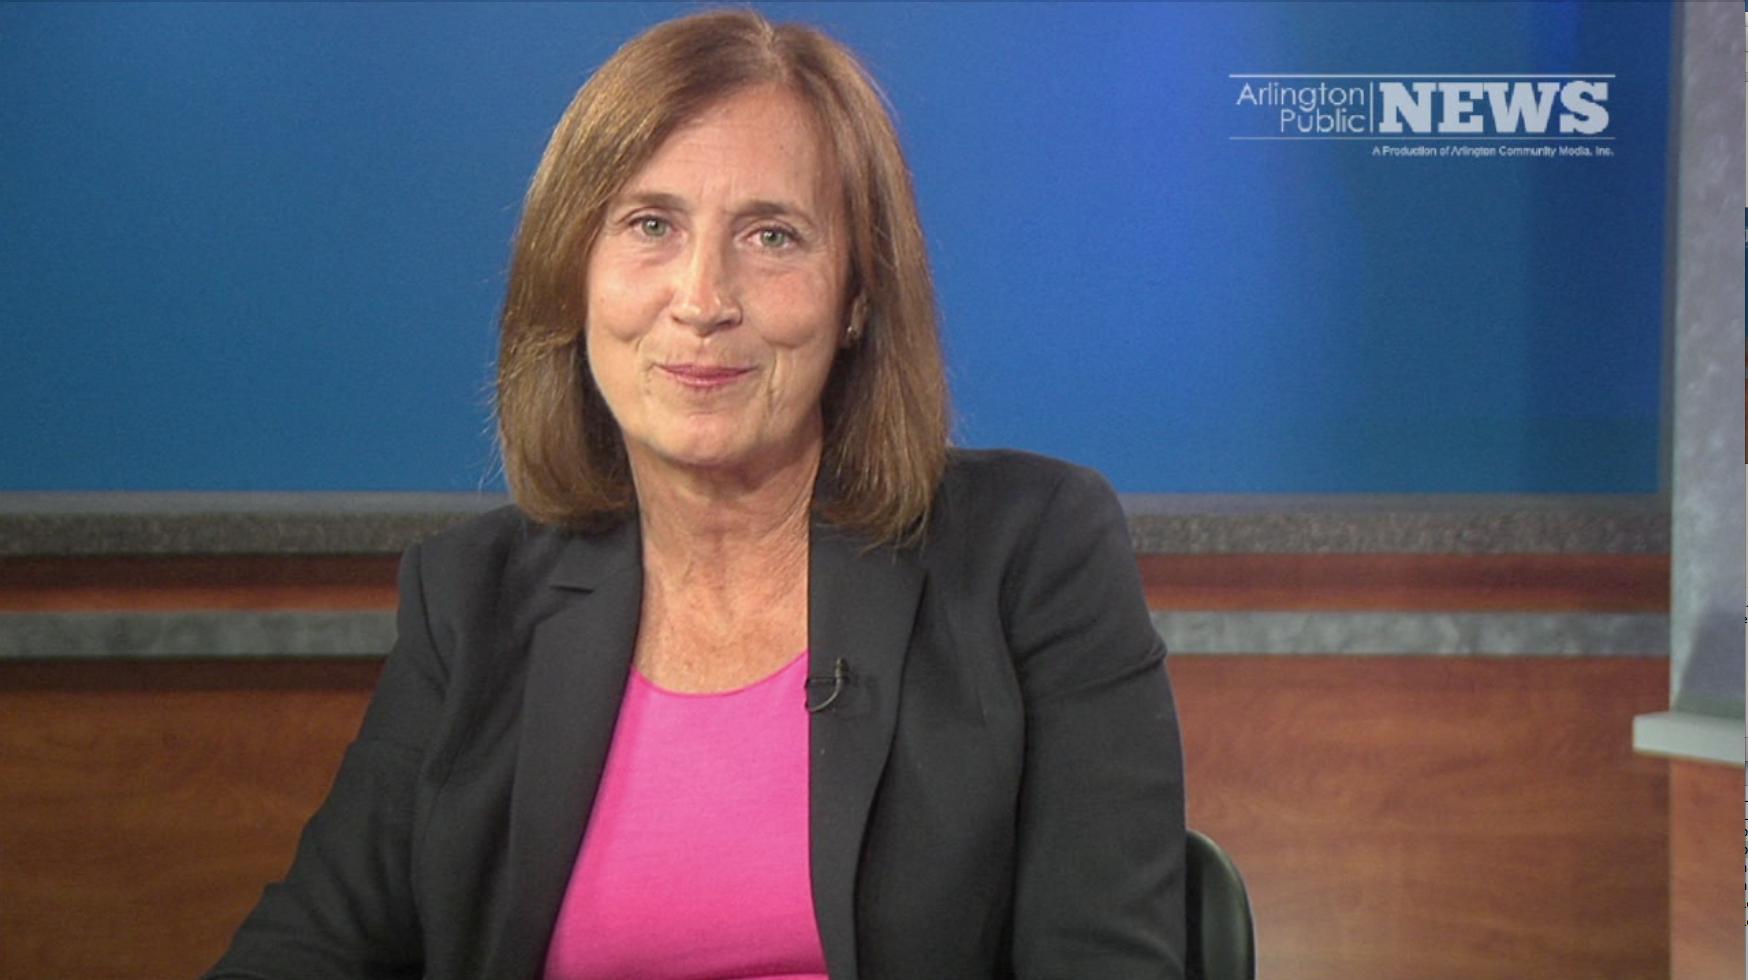 2014 State Primary – Treasurer: Deborah B. Goldberg (D)